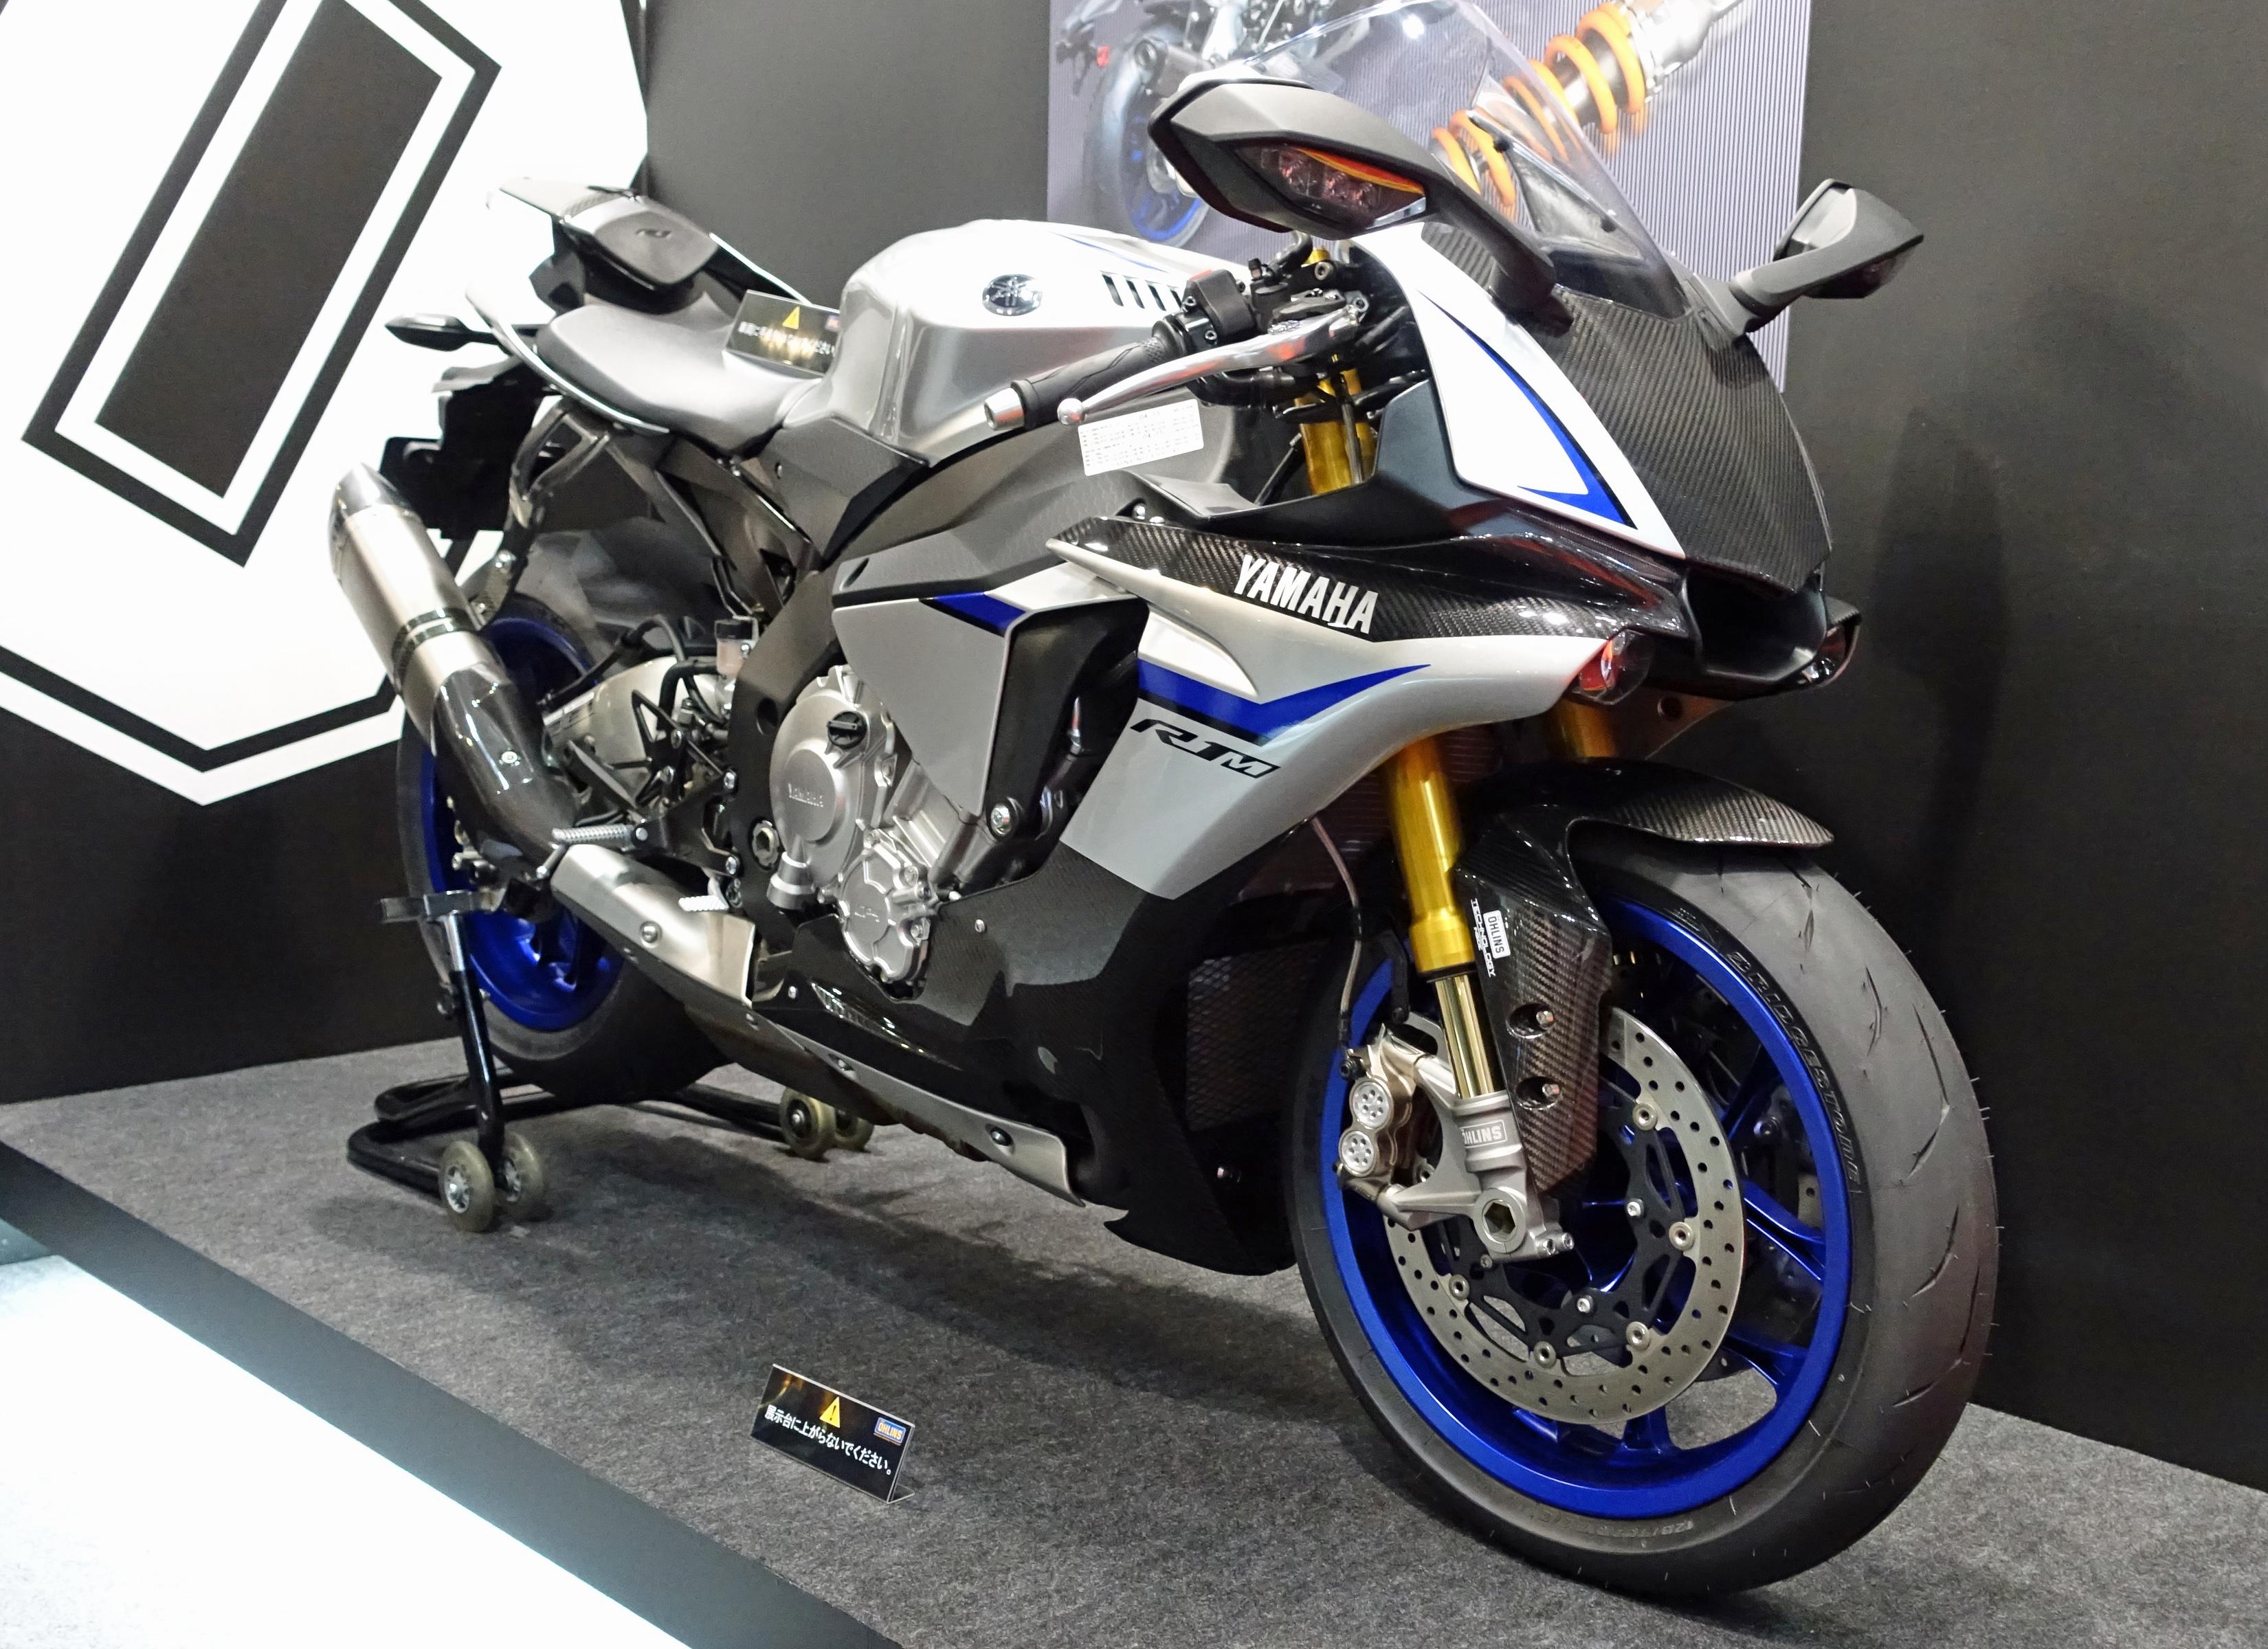 file yamaha yzf r1m at the tokyo motor show 2015 jpg wikimedia commons